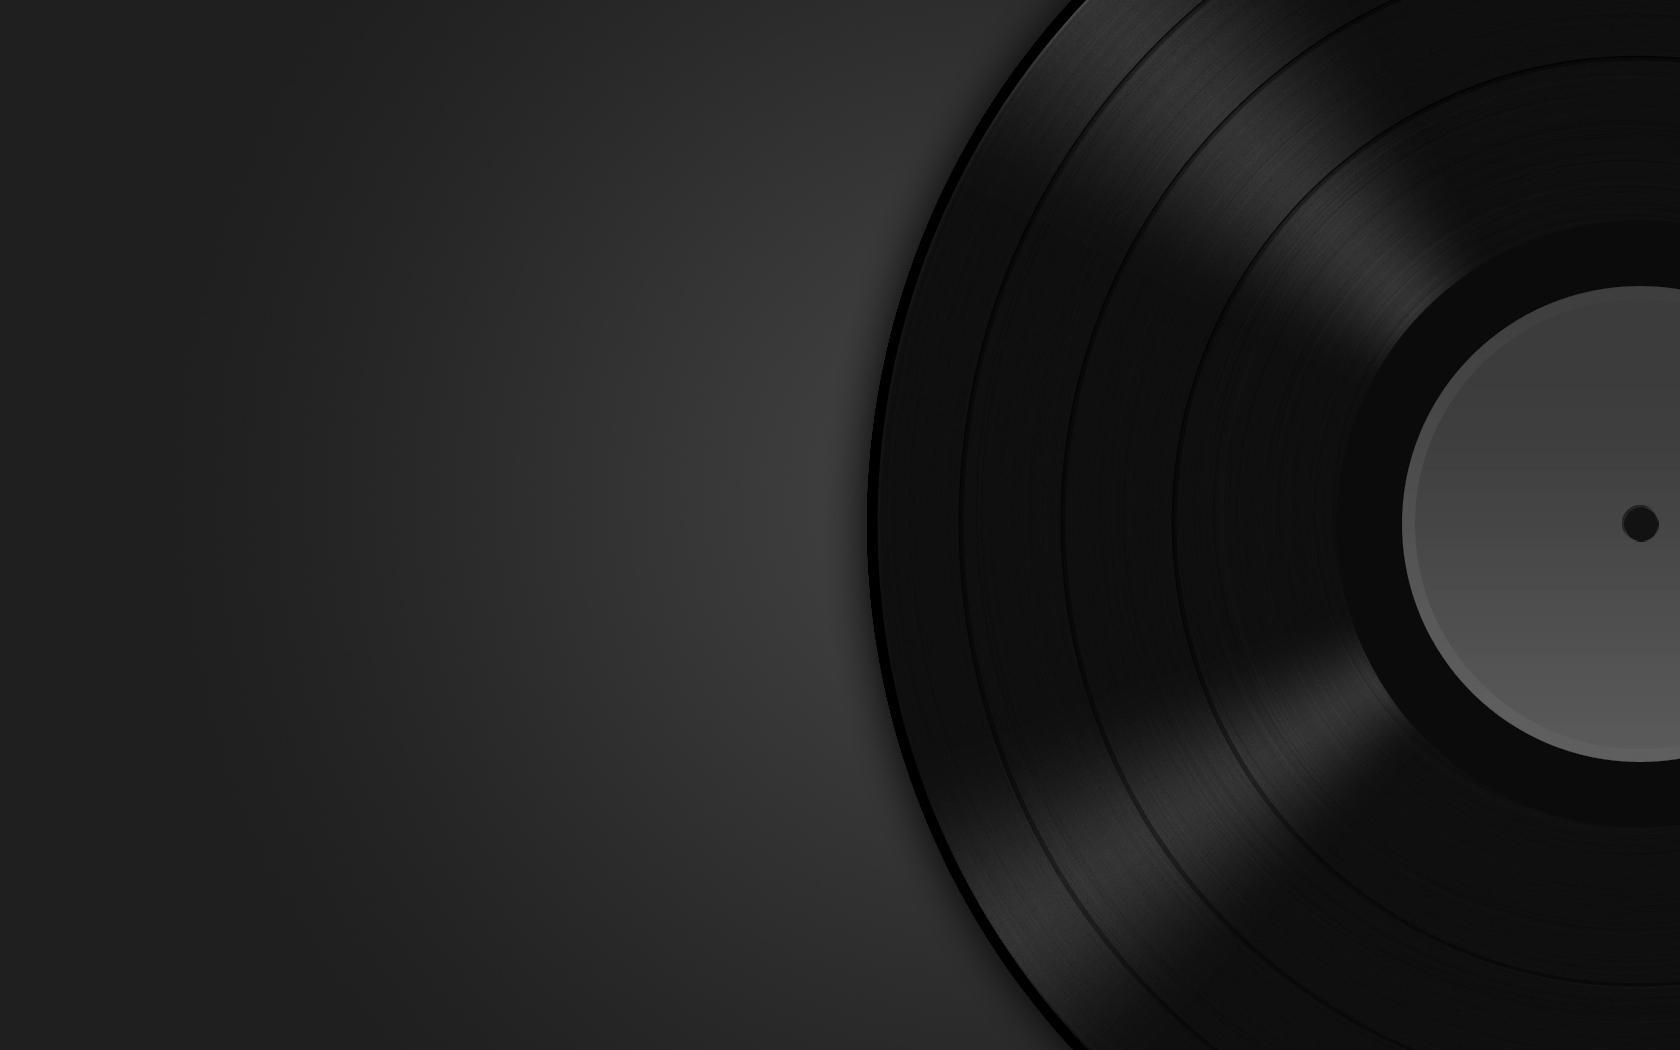 Kendrick lamar wallpaper 1920x1080 28727 for Vinyl wallpaper